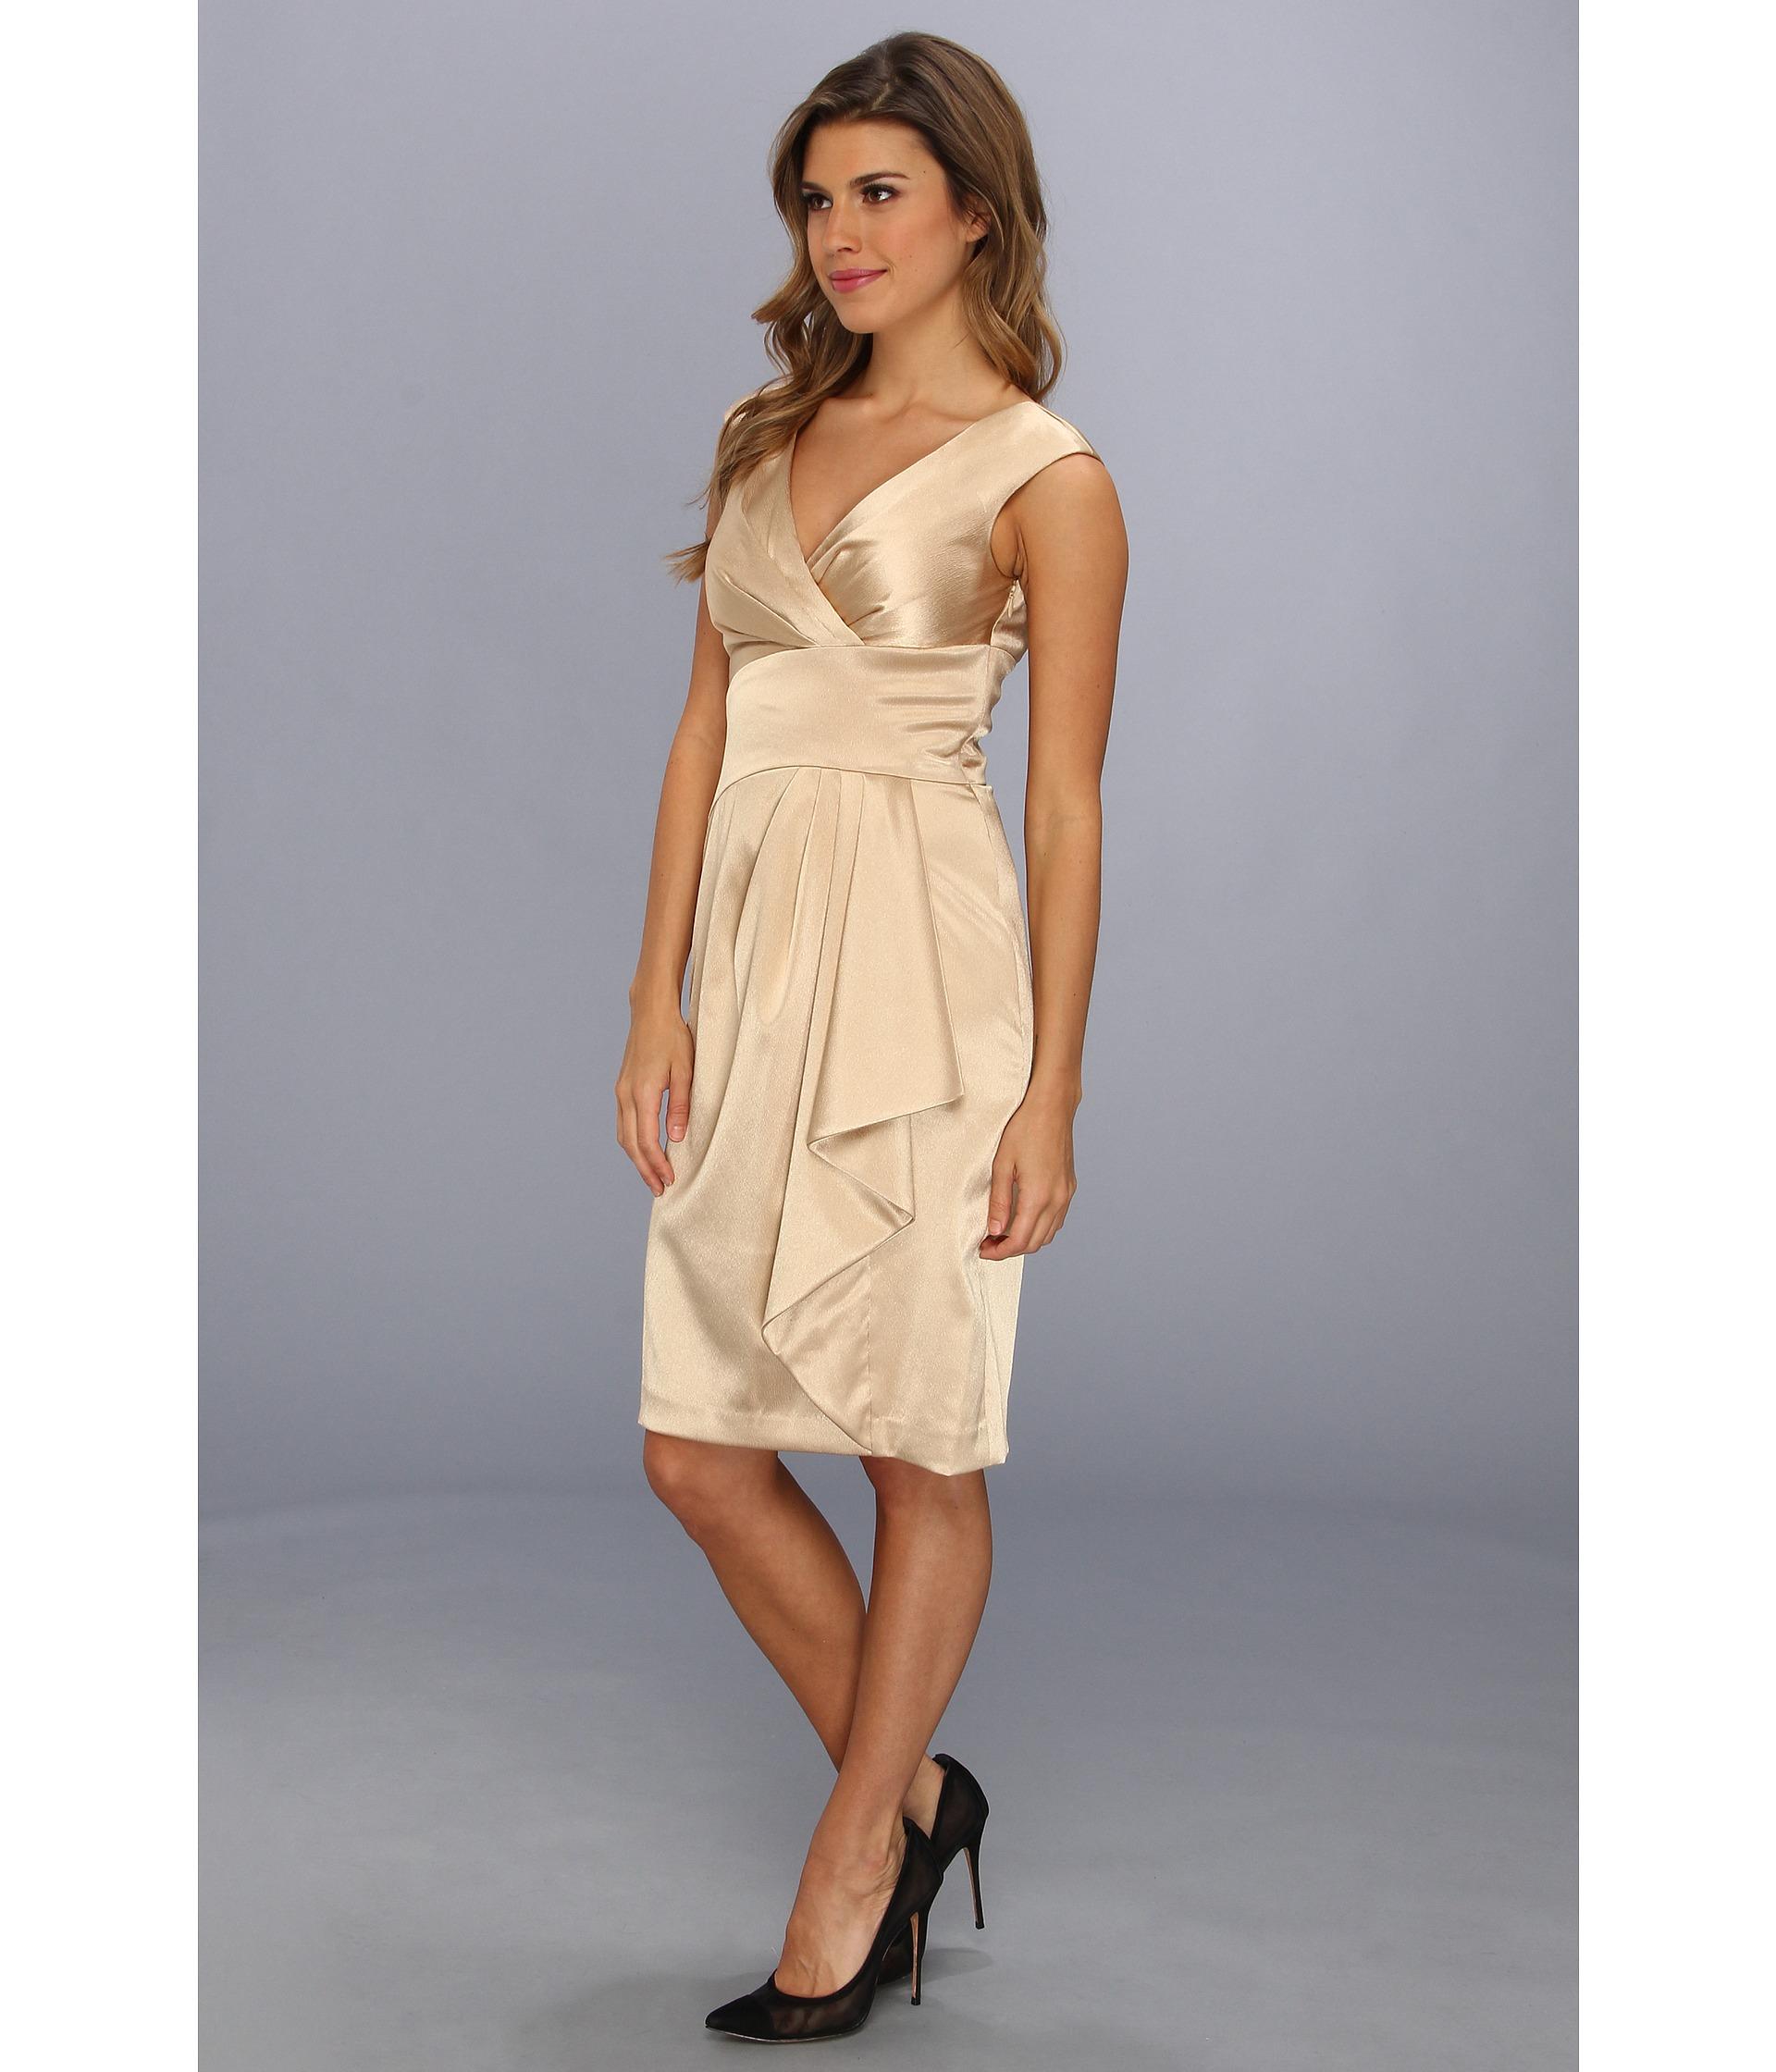 Lyst - Maggy London Luster Crepe Side Drape Dress in Metallic